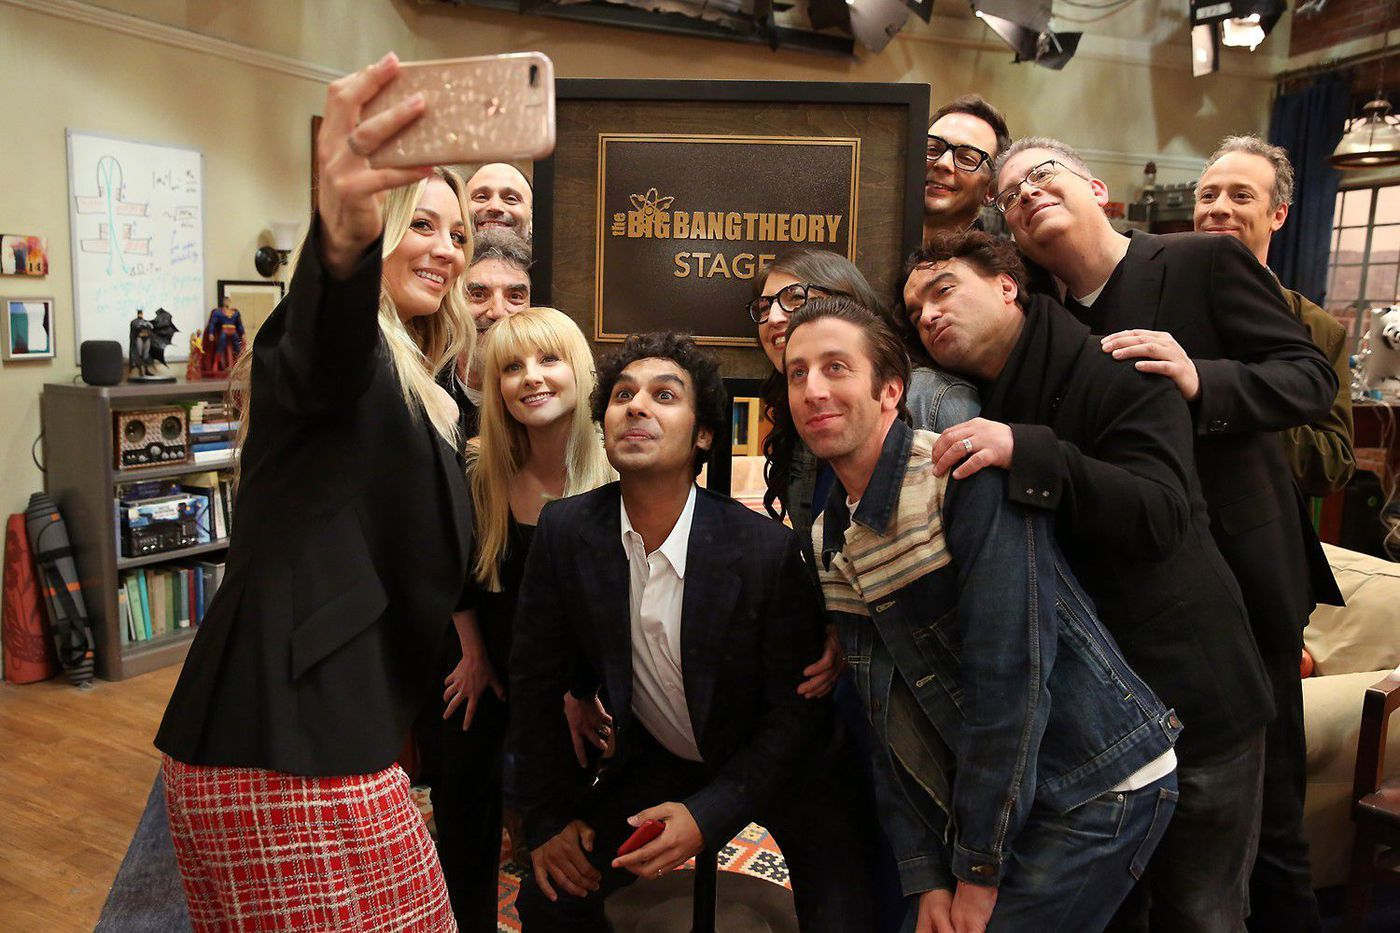 The Big Bang Theory': 12 lessons from TV's biggest comedy House Plan Big Bang Html on lady gaga house, black hole house, psy house, lee hyori house, big party house, iggy azalea house, mariah carey house, lollipop house, big long house,